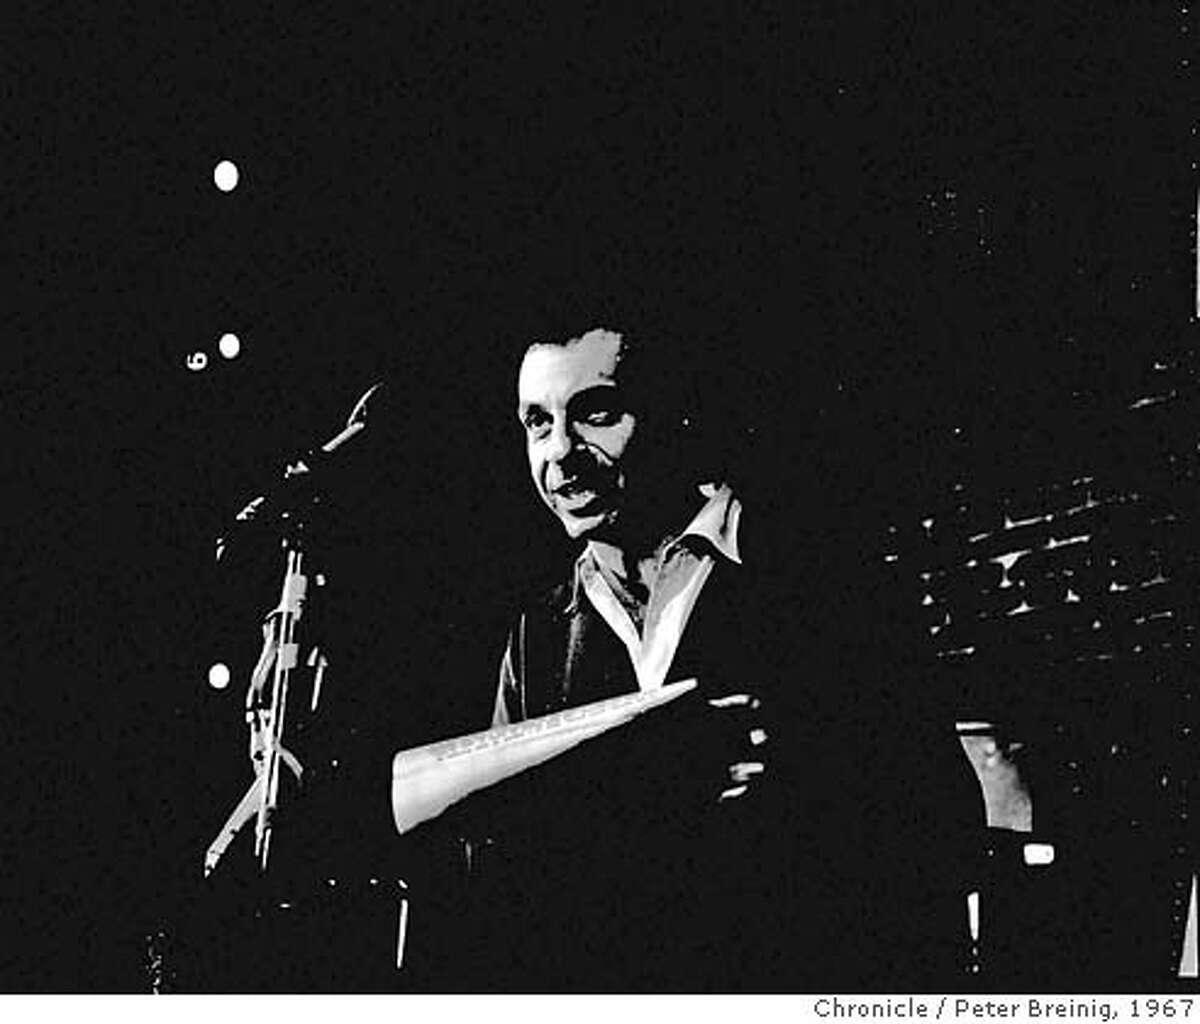 SAHL-B-07DEC67-MN-BREINIG - Mort Shl at the Hungry I night club. Photo by Peter Breinig FILE PHOTO